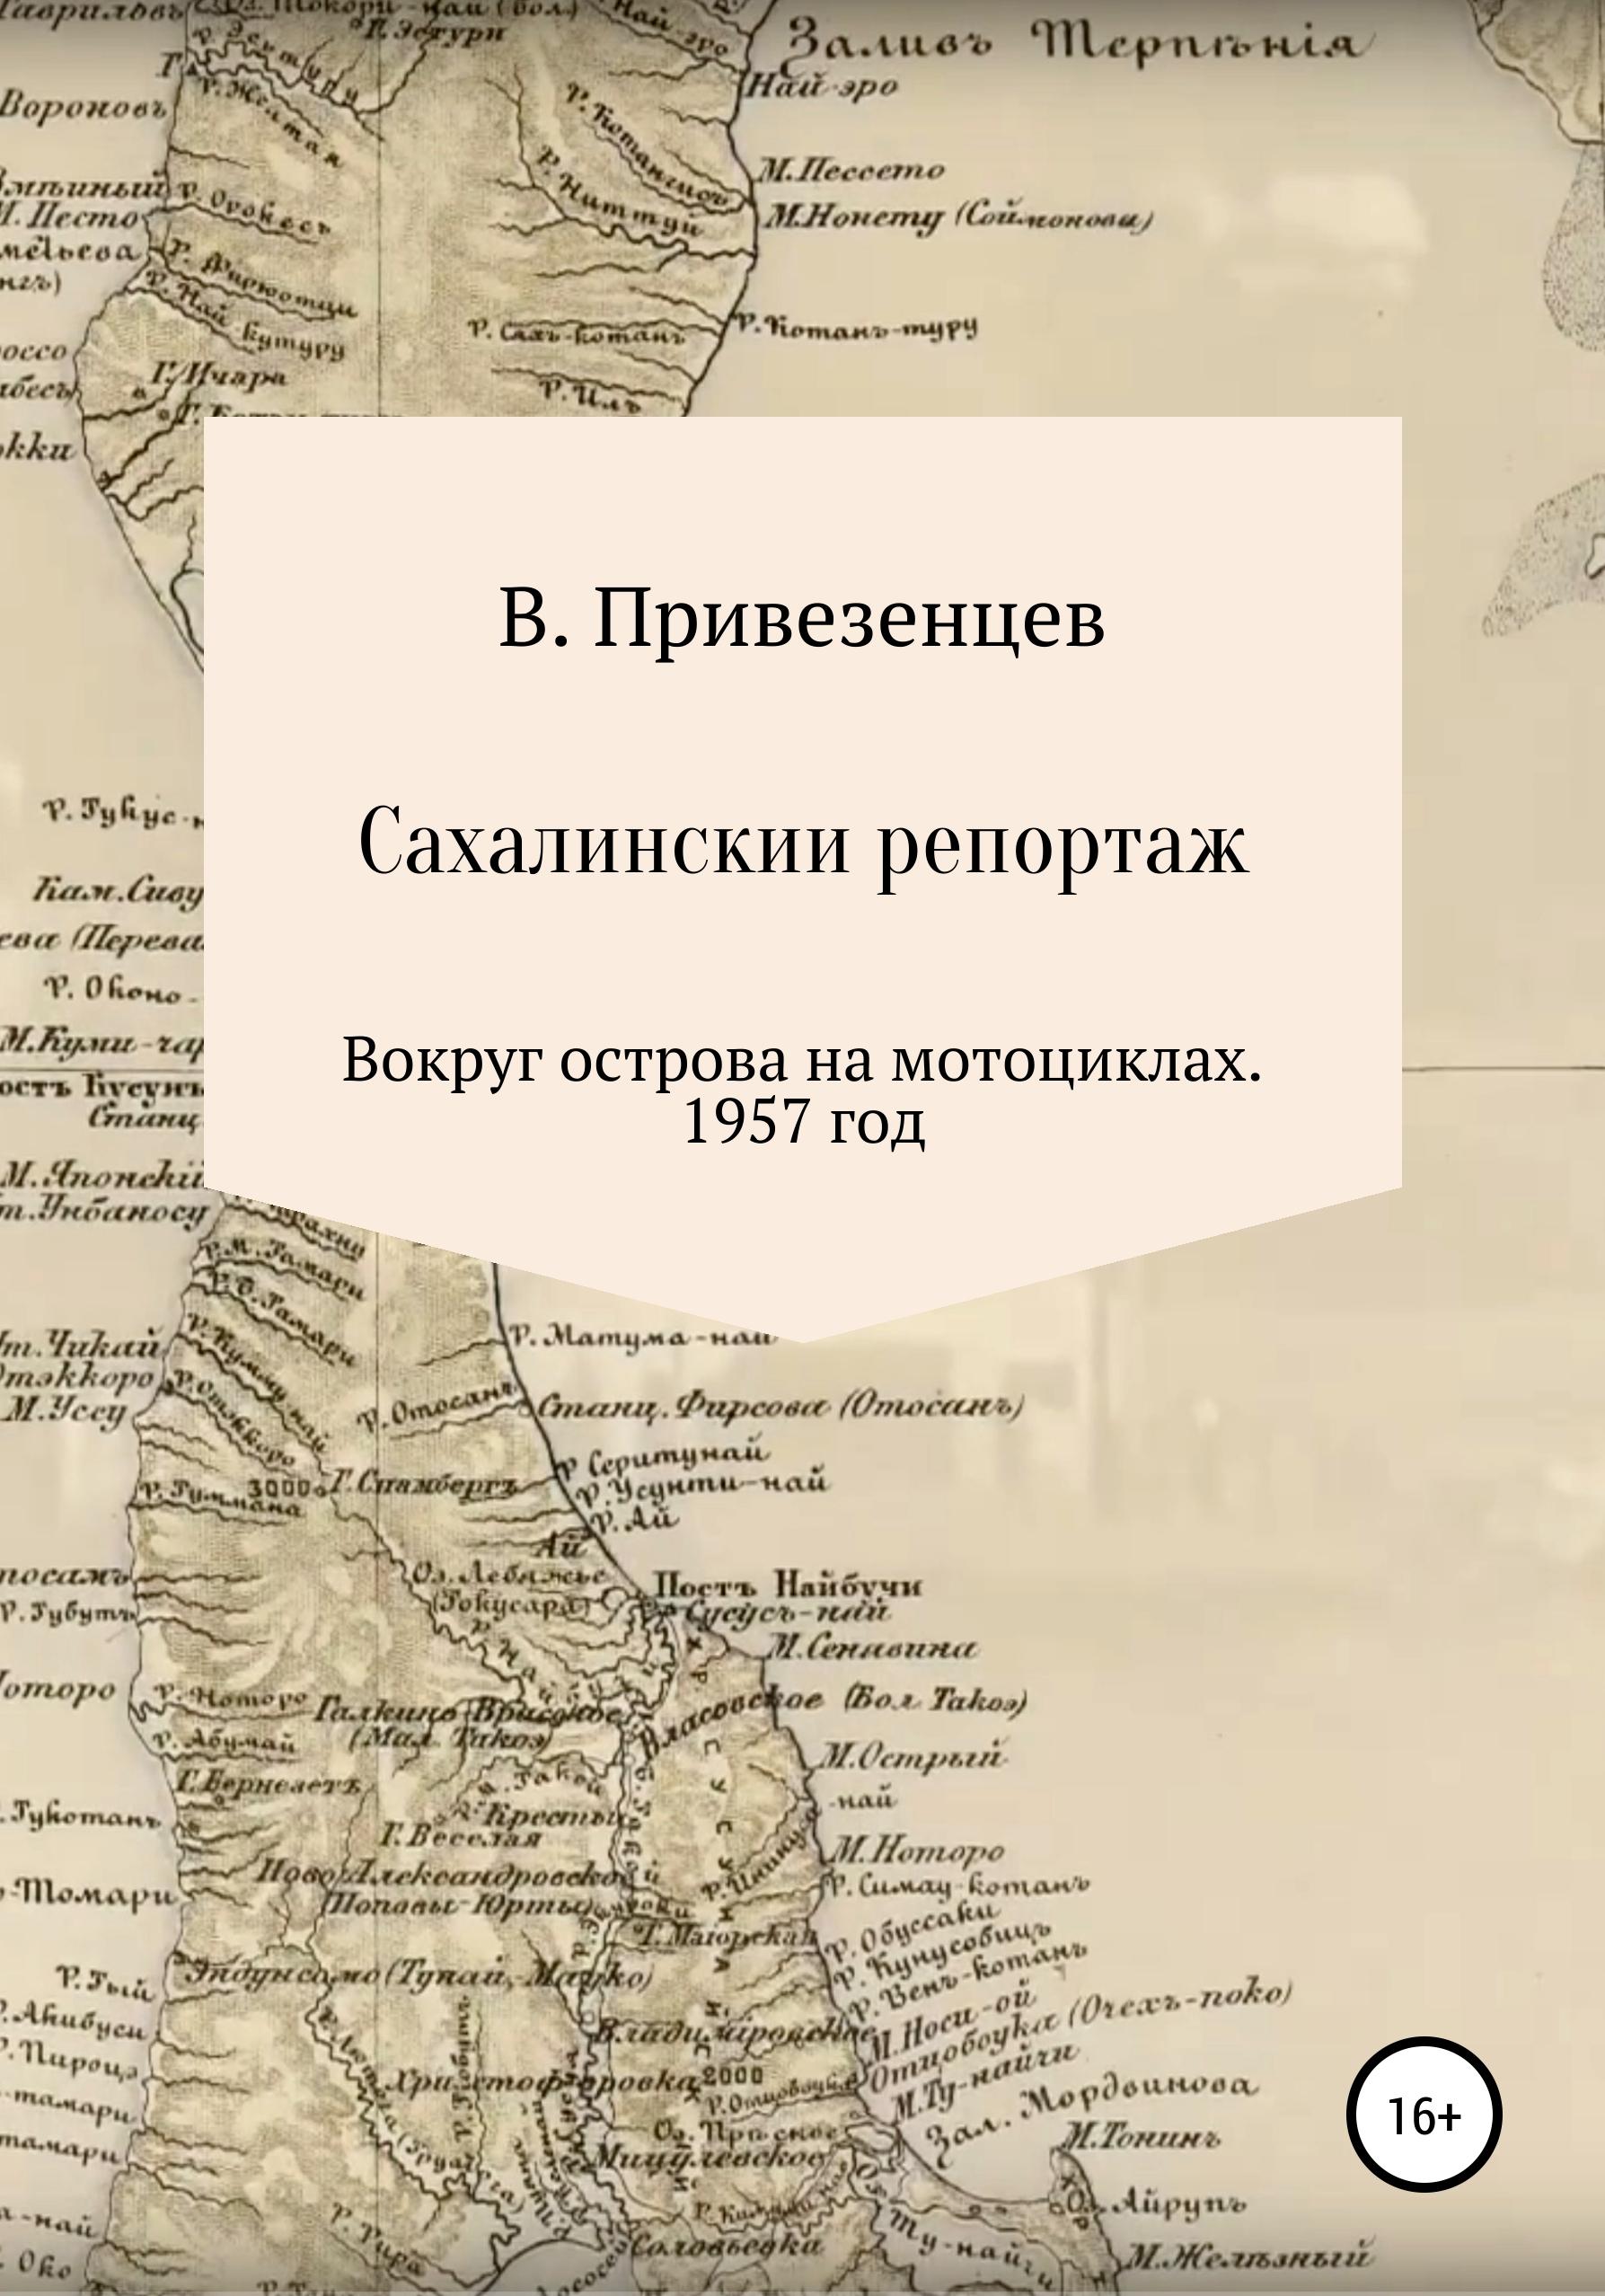 Сахалинский репортаж. Вокруг острова на мотоциклах. 1957 год